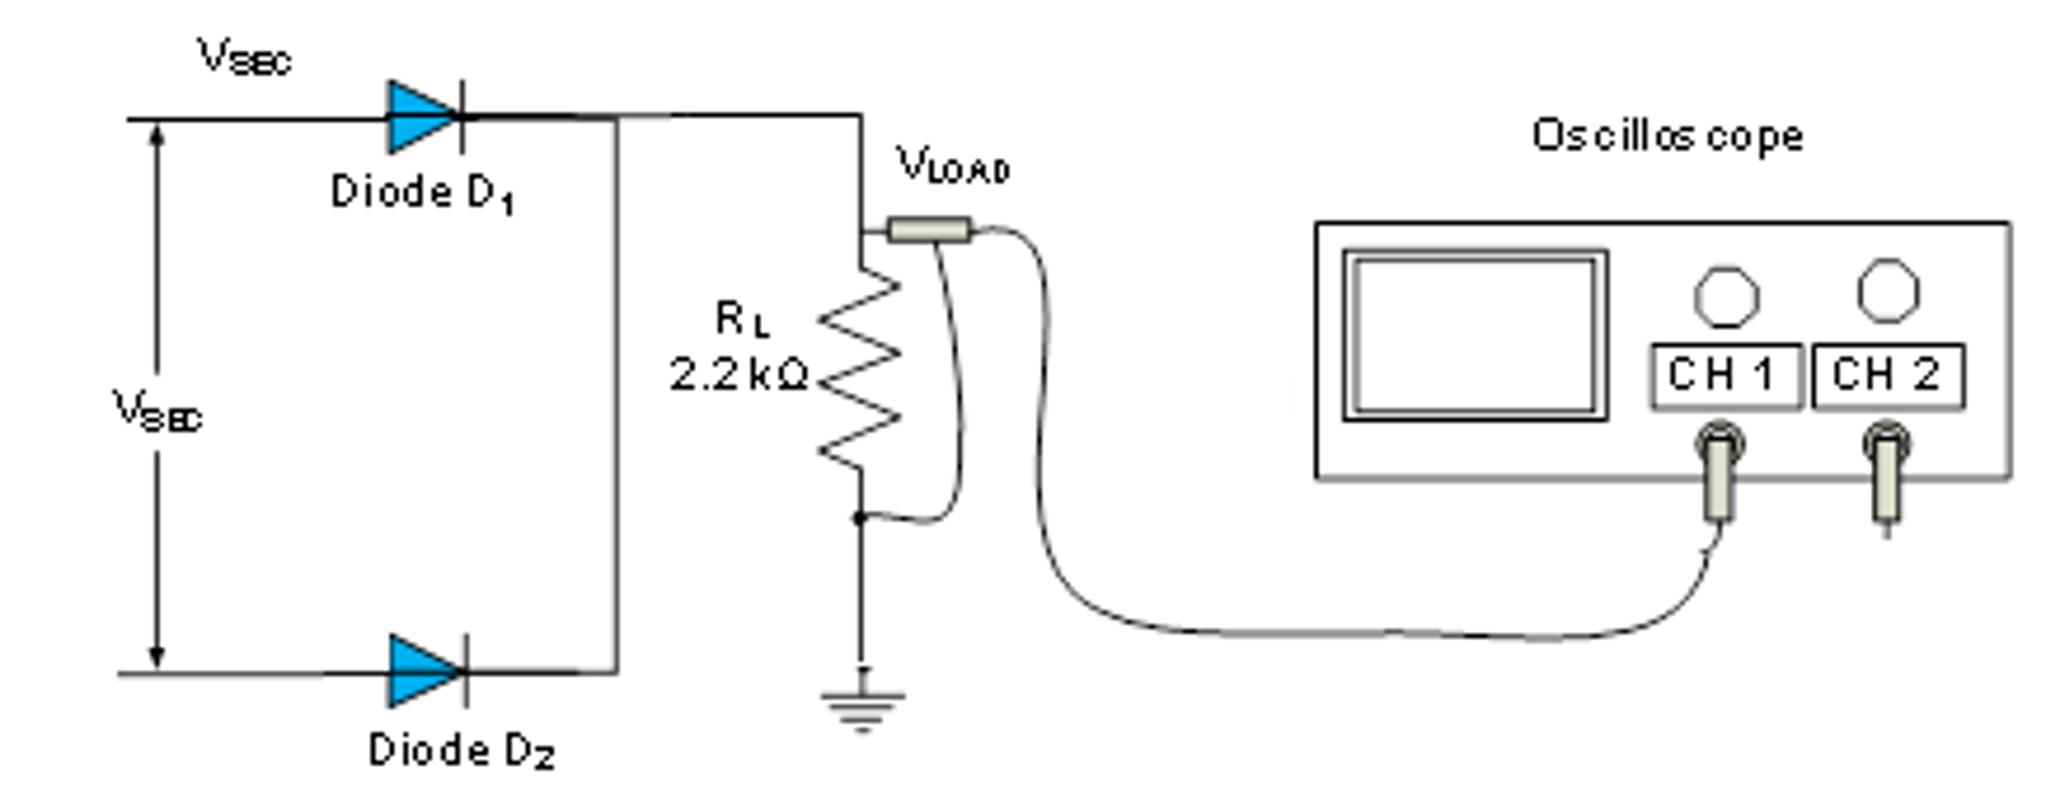 Half Bridge Rectifier Fullwave Circuit Part Full Wave Rectification Software Multisi 2046x798